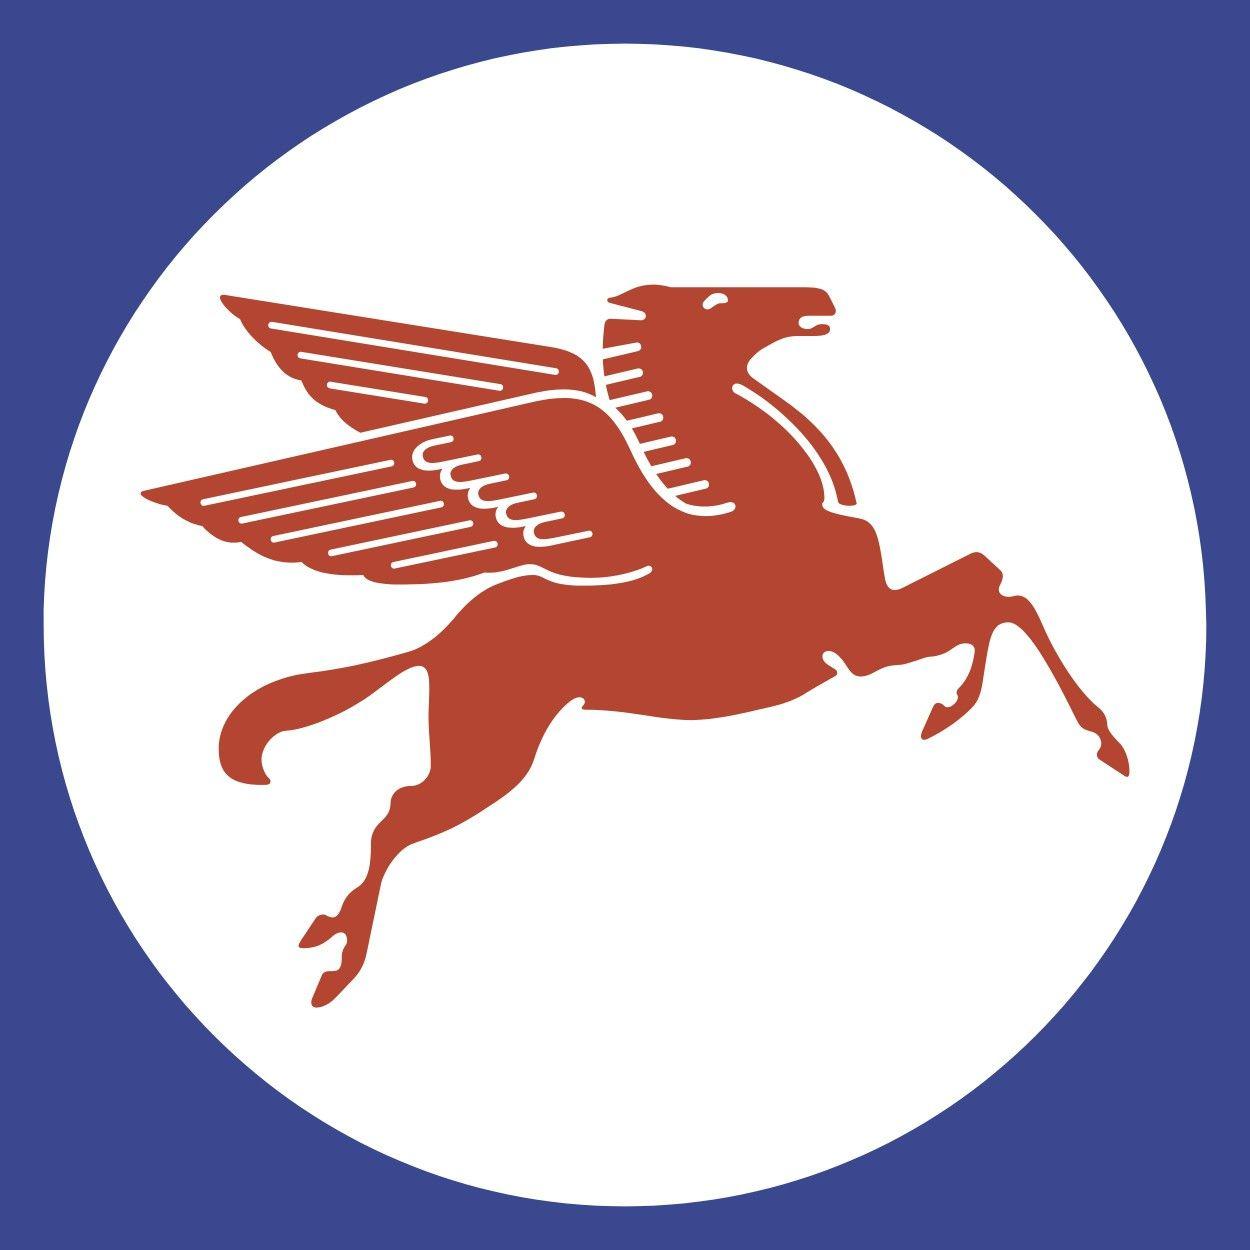 Mobil Pegasus Or Flying Red Horse Logo Originally Part Of